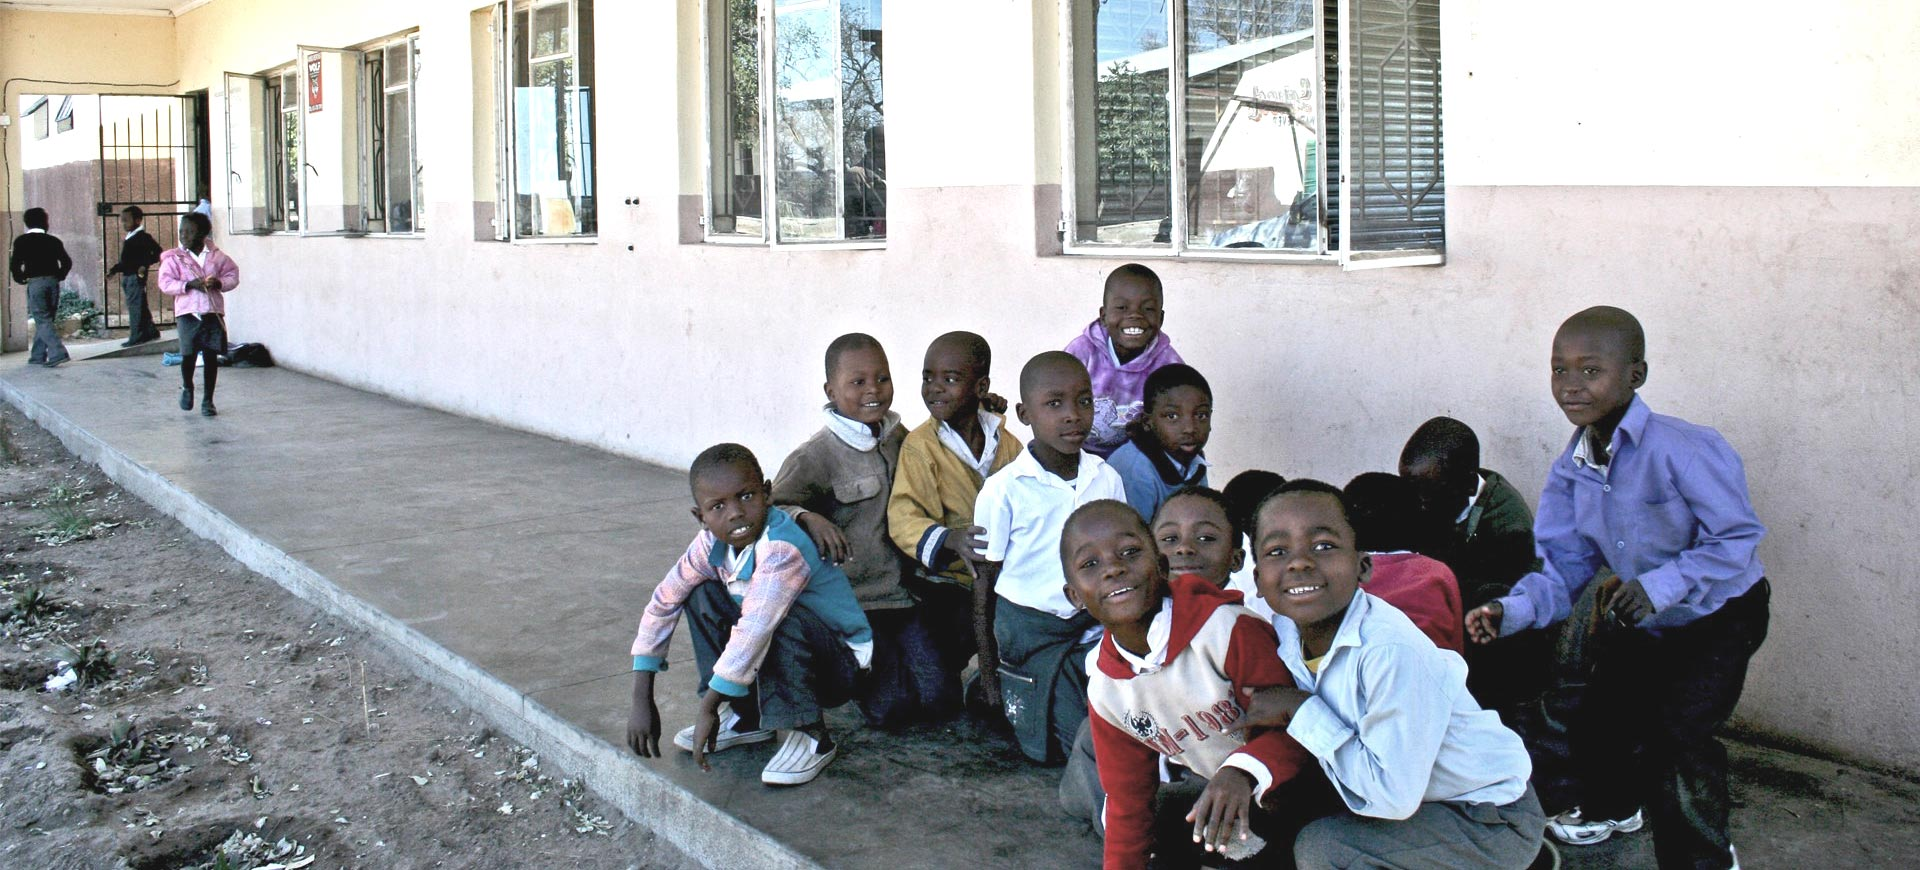 Kruger Community Project